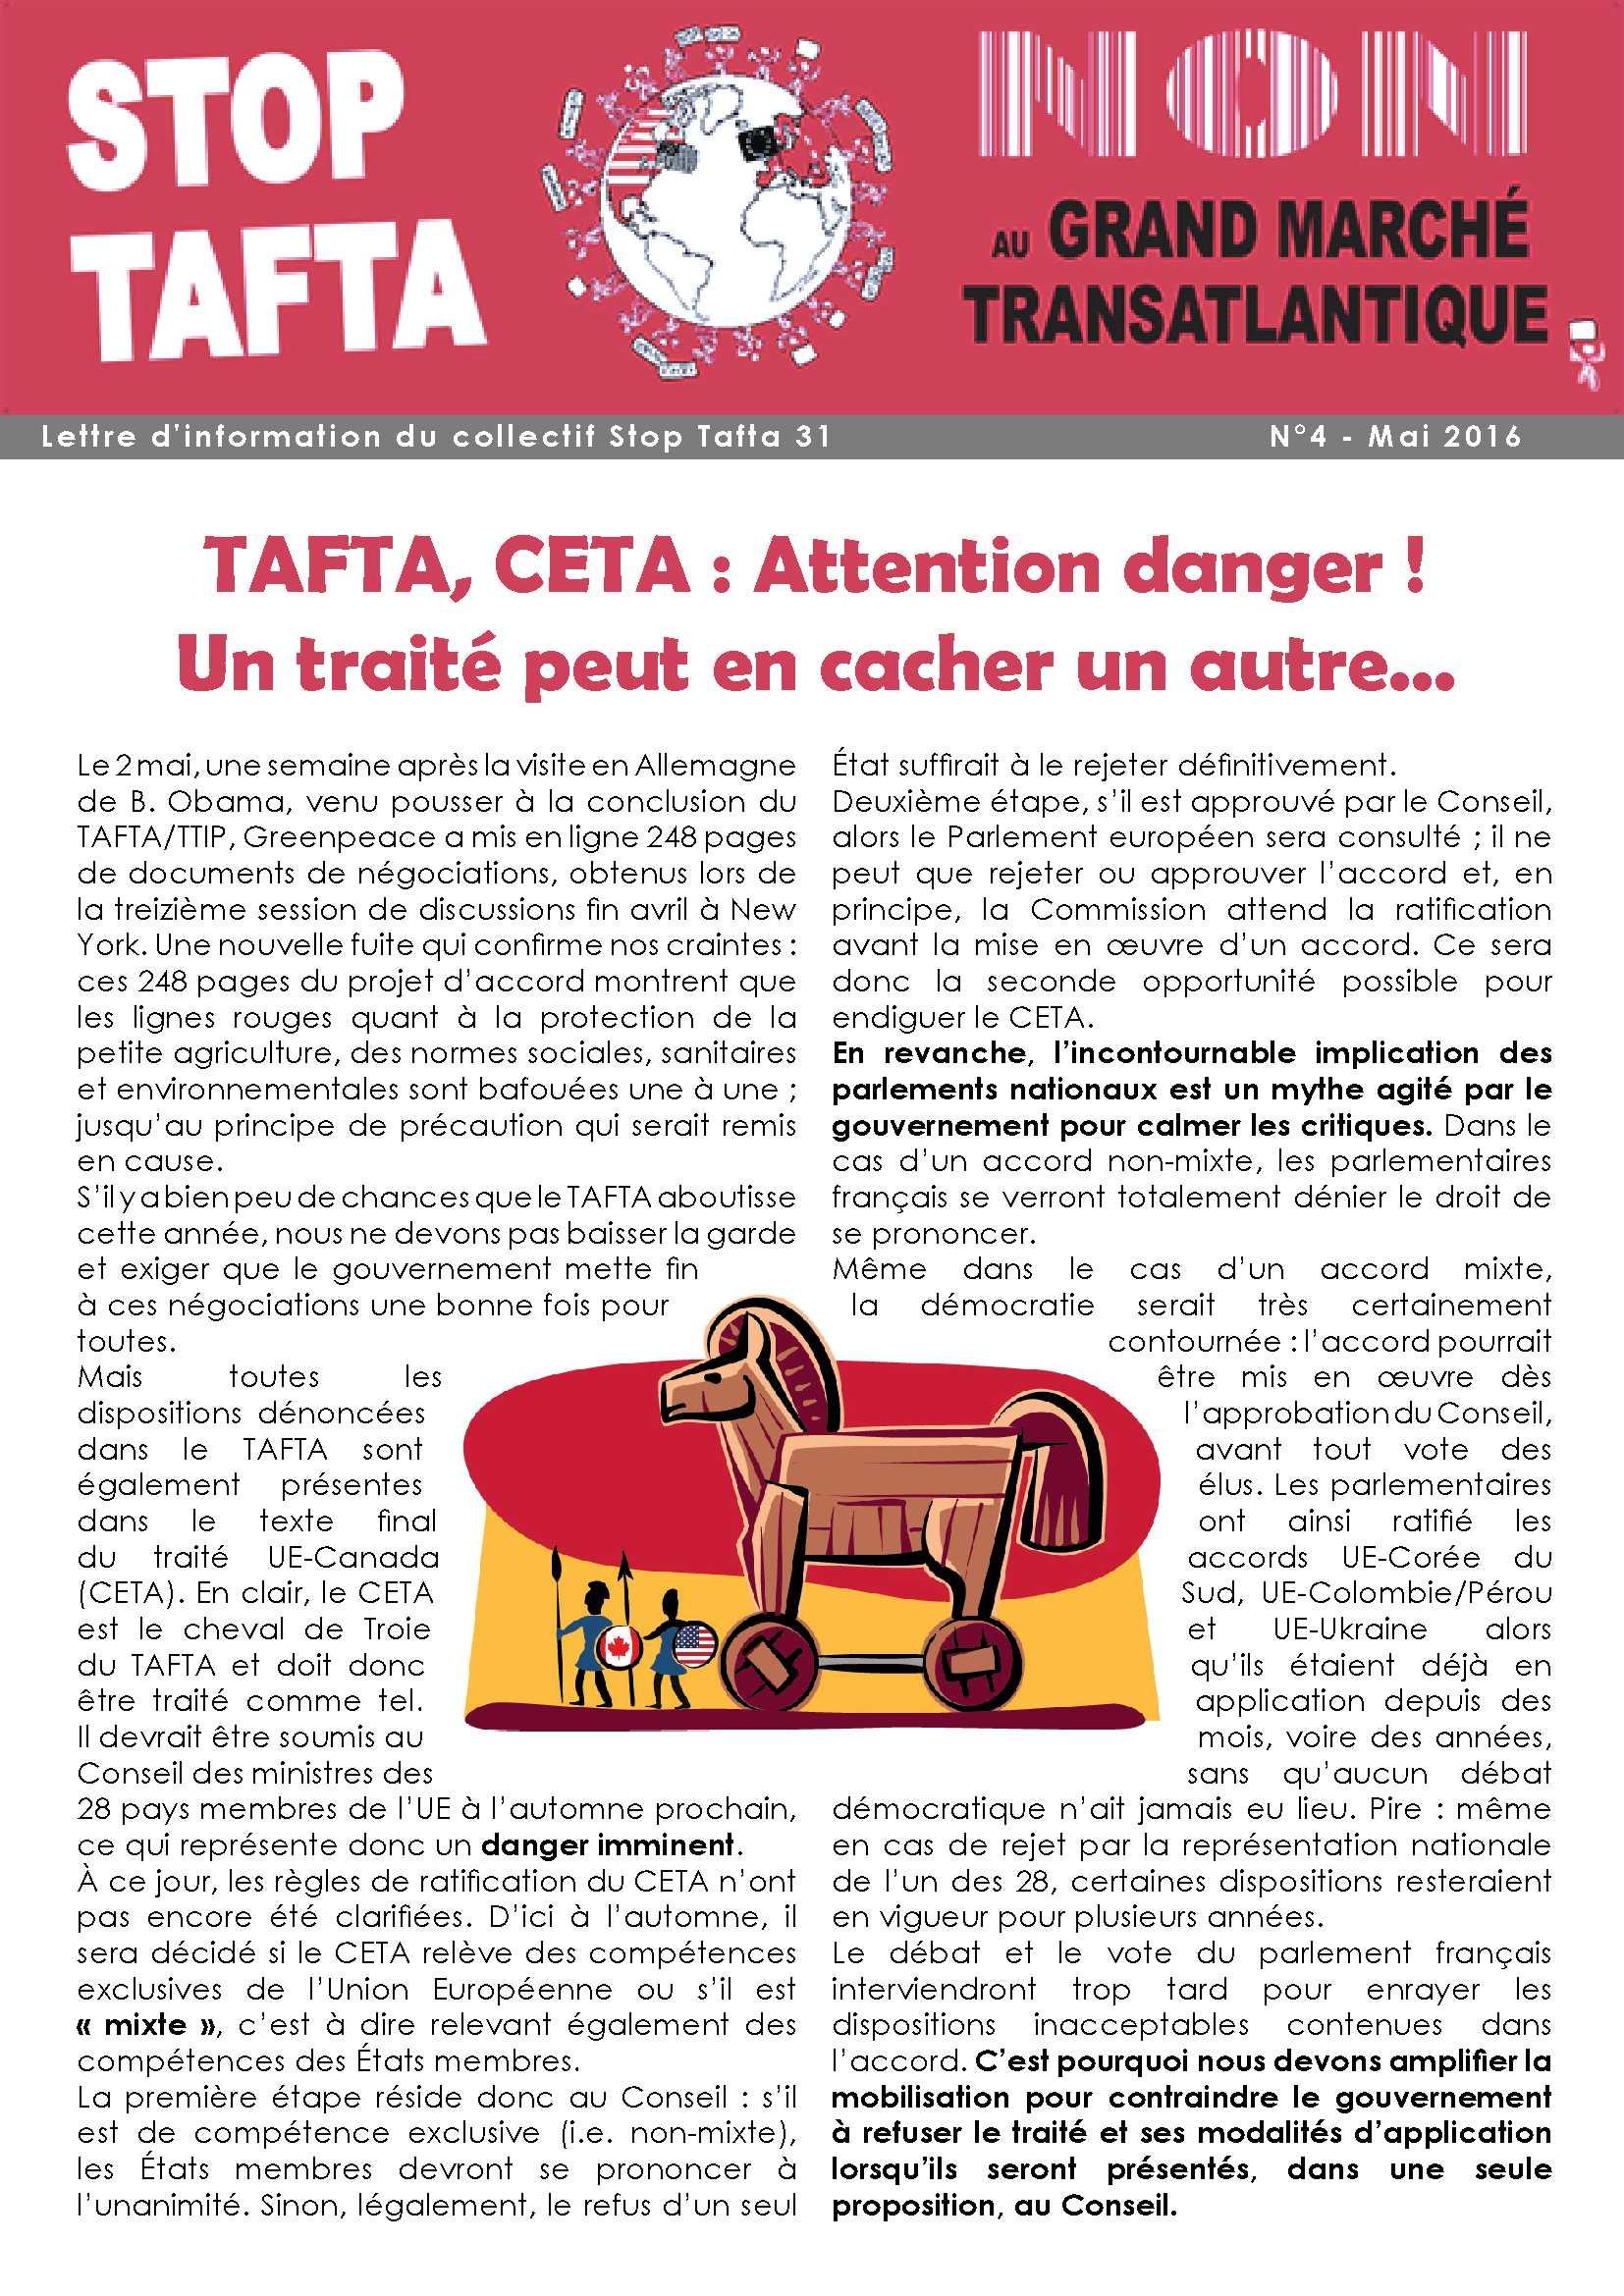 lettre_stop_tafta_31_no4_1.jpg